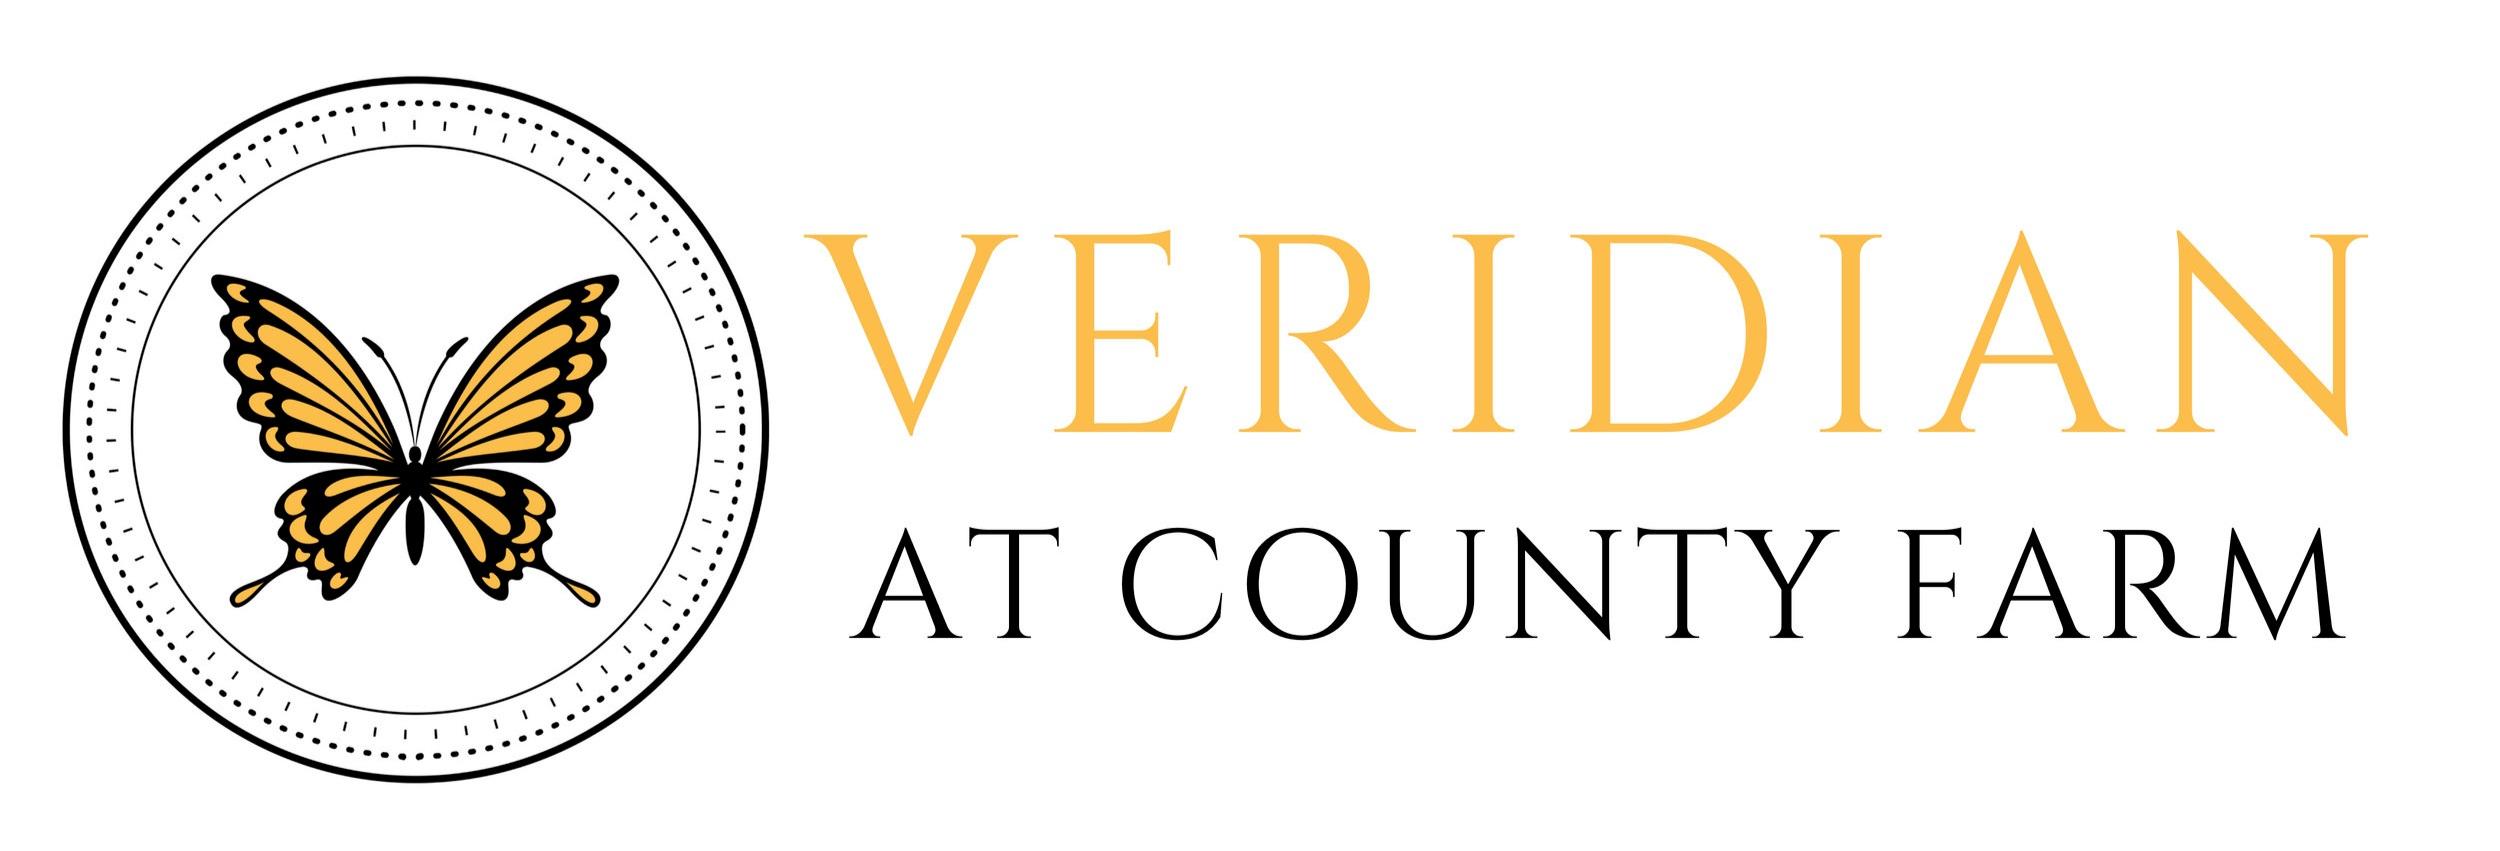 Veridian+Logo+Orange+Butterfly+Seal+-+Horizontal.jpg